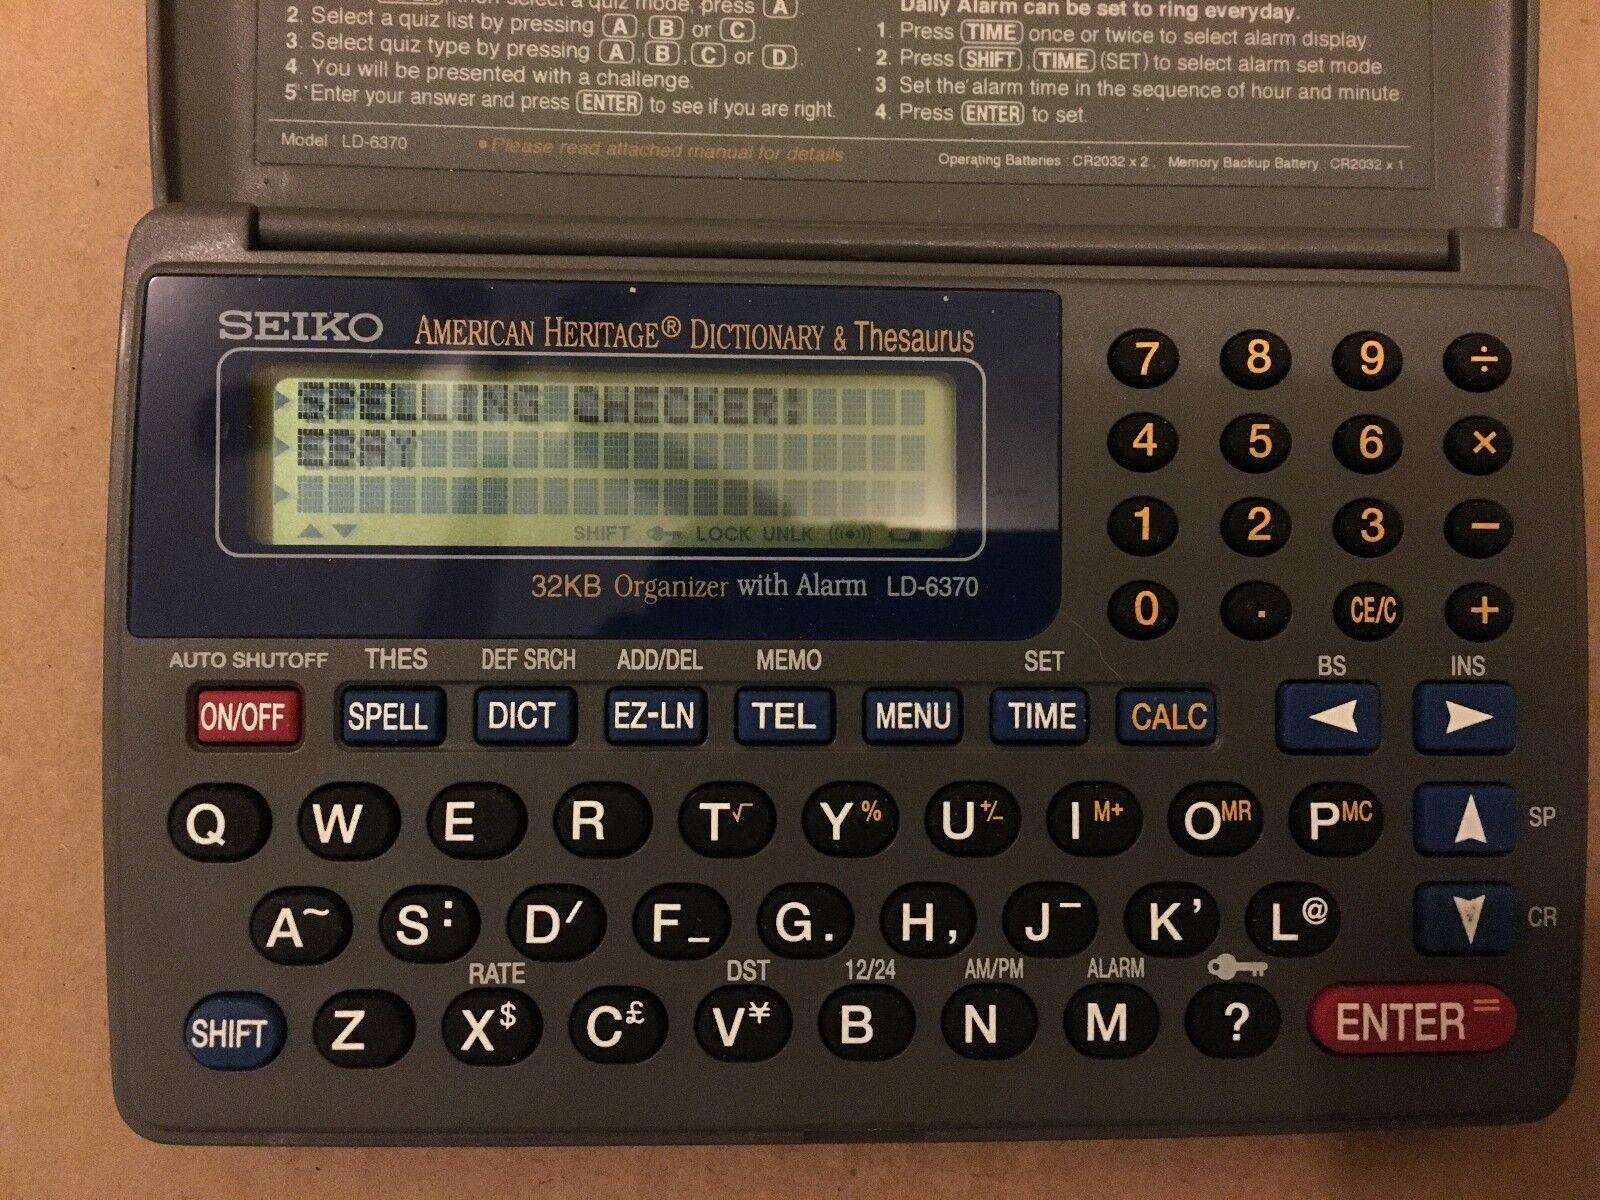 SEIKO American Heritage Dictionary & Thesaurus 32KB Organizer w/ Alarm LD-6370